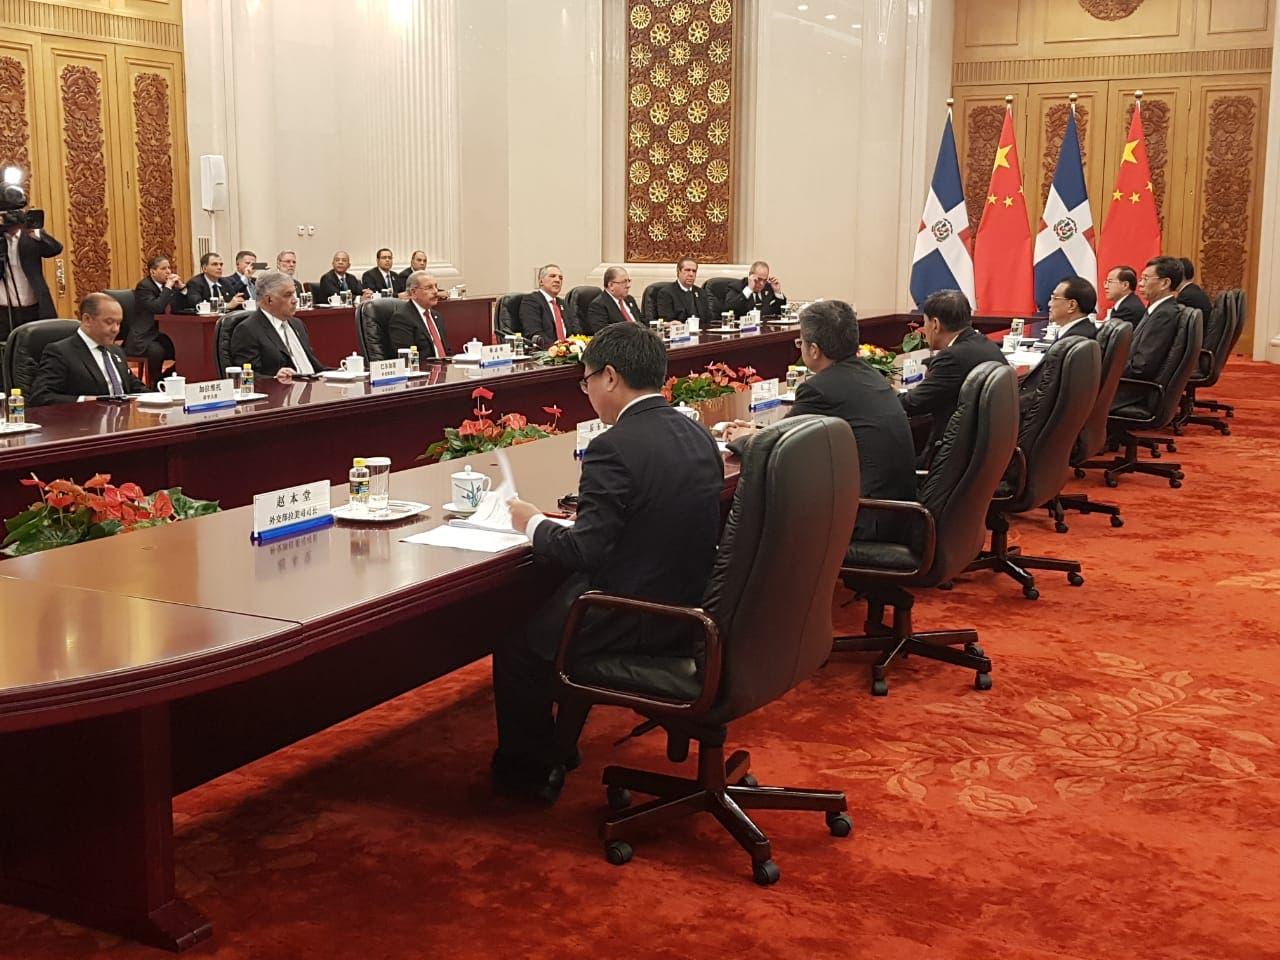 12. El presidente Danilo Medina se reunió con el primer ministro de la República Popular China, Li Keqiang.